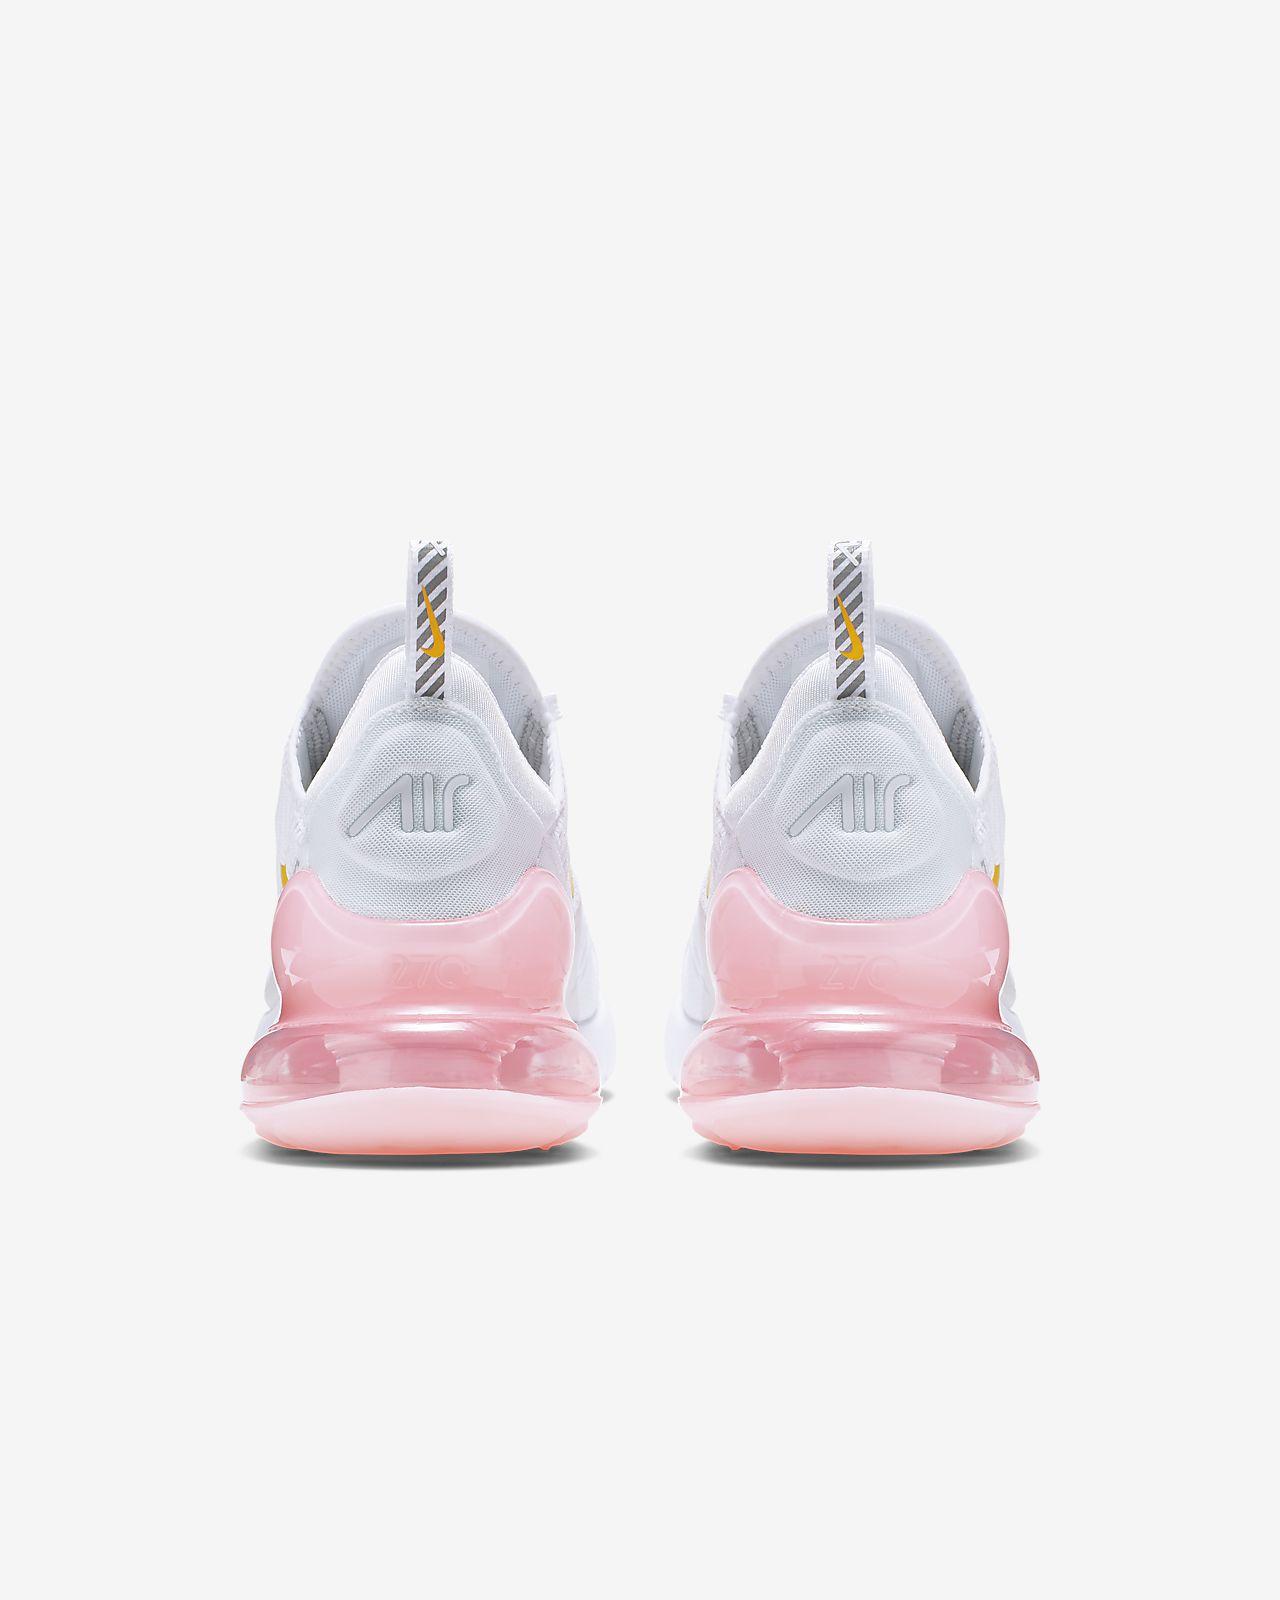 separation shoes 8b958 1961b ... Nike Air Max 270 Women s Shoe